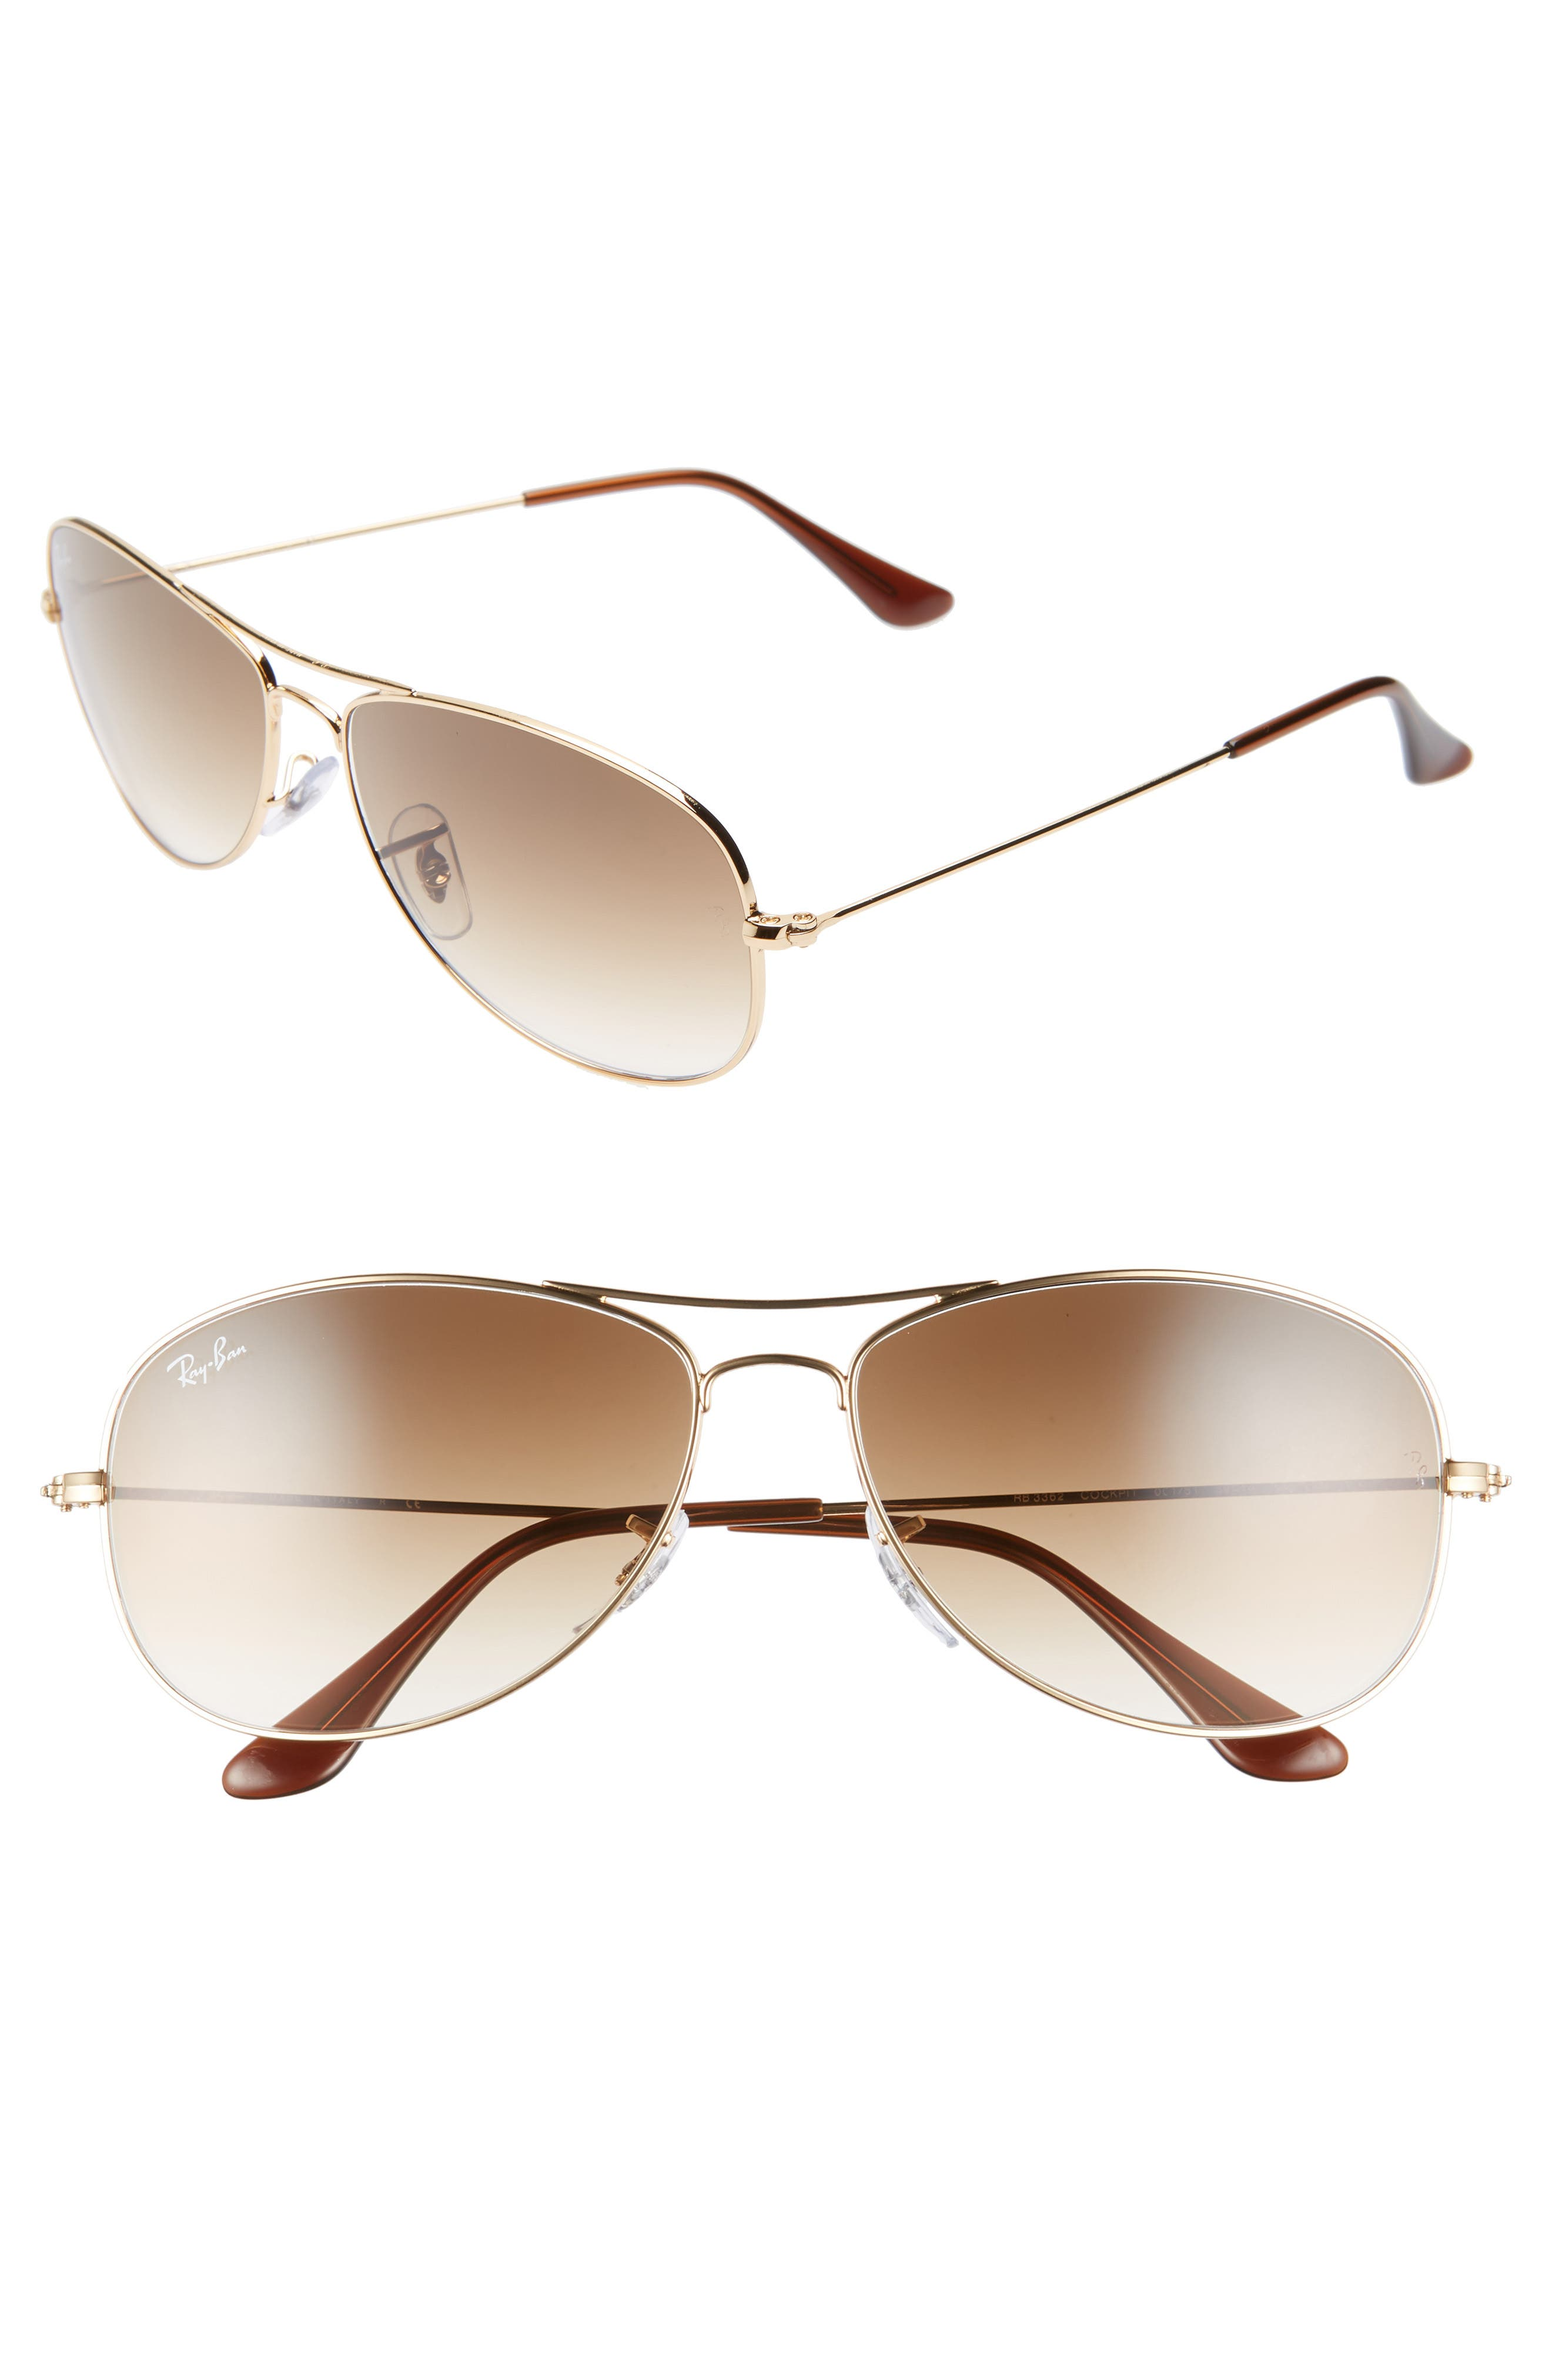 Ray-Ban New Classic Aviator 5m Sunglasses - Gold/ Brown Gradient